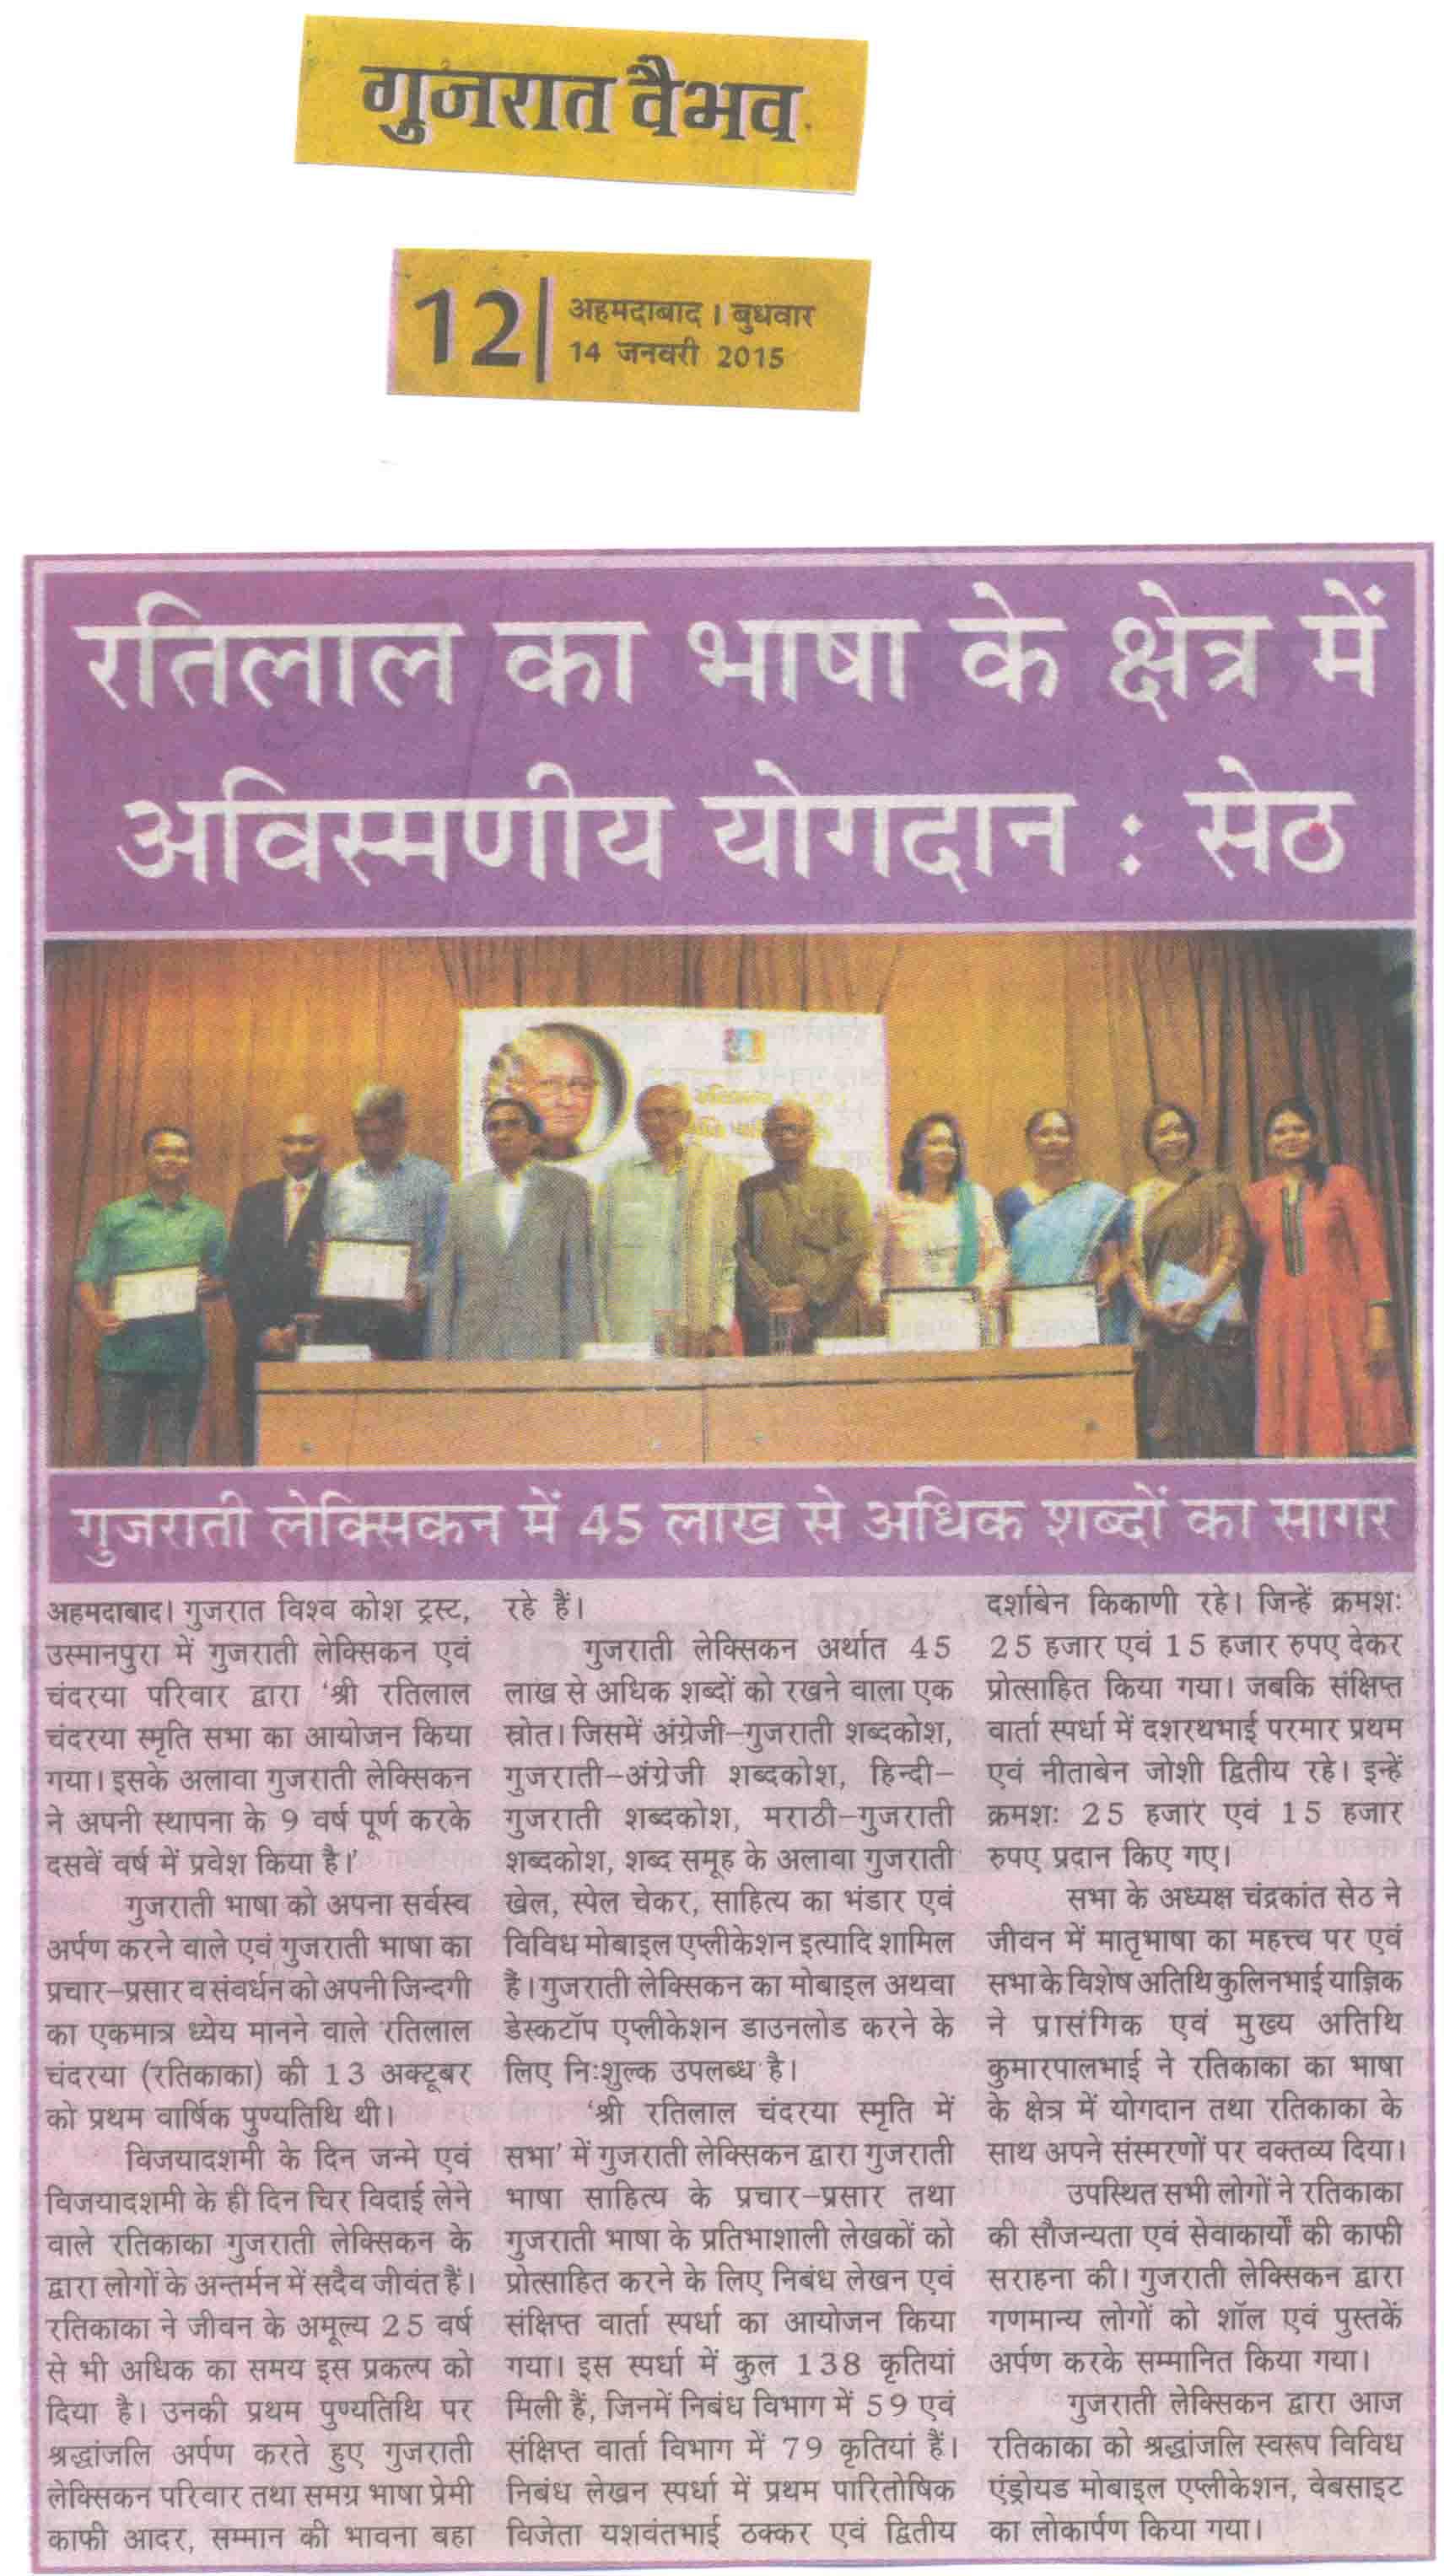 Gujarat Vaibhav Page12 140115